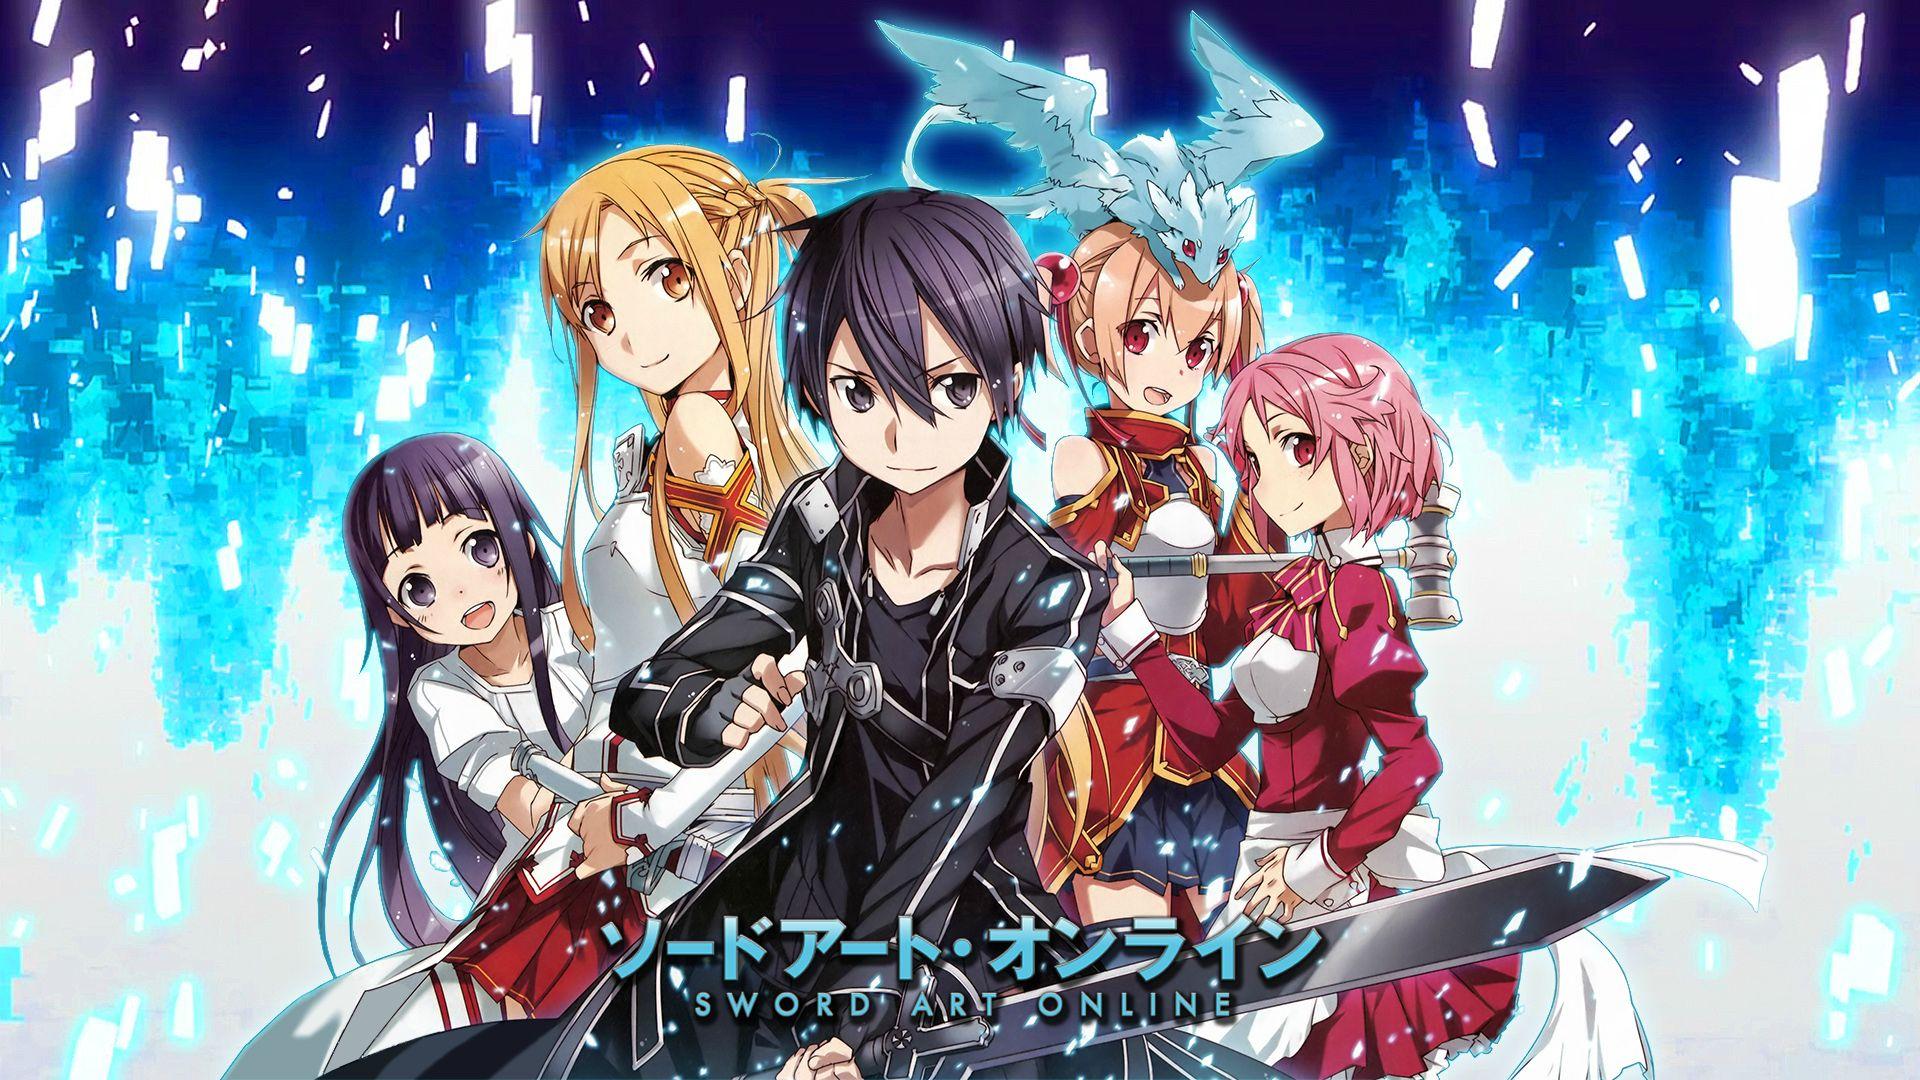 Sword Art Online games coming to Australia! | SBS PopAsia BANDAI NAMCO Entertainment Europe has announced that the Sword Art Online video games will be ...